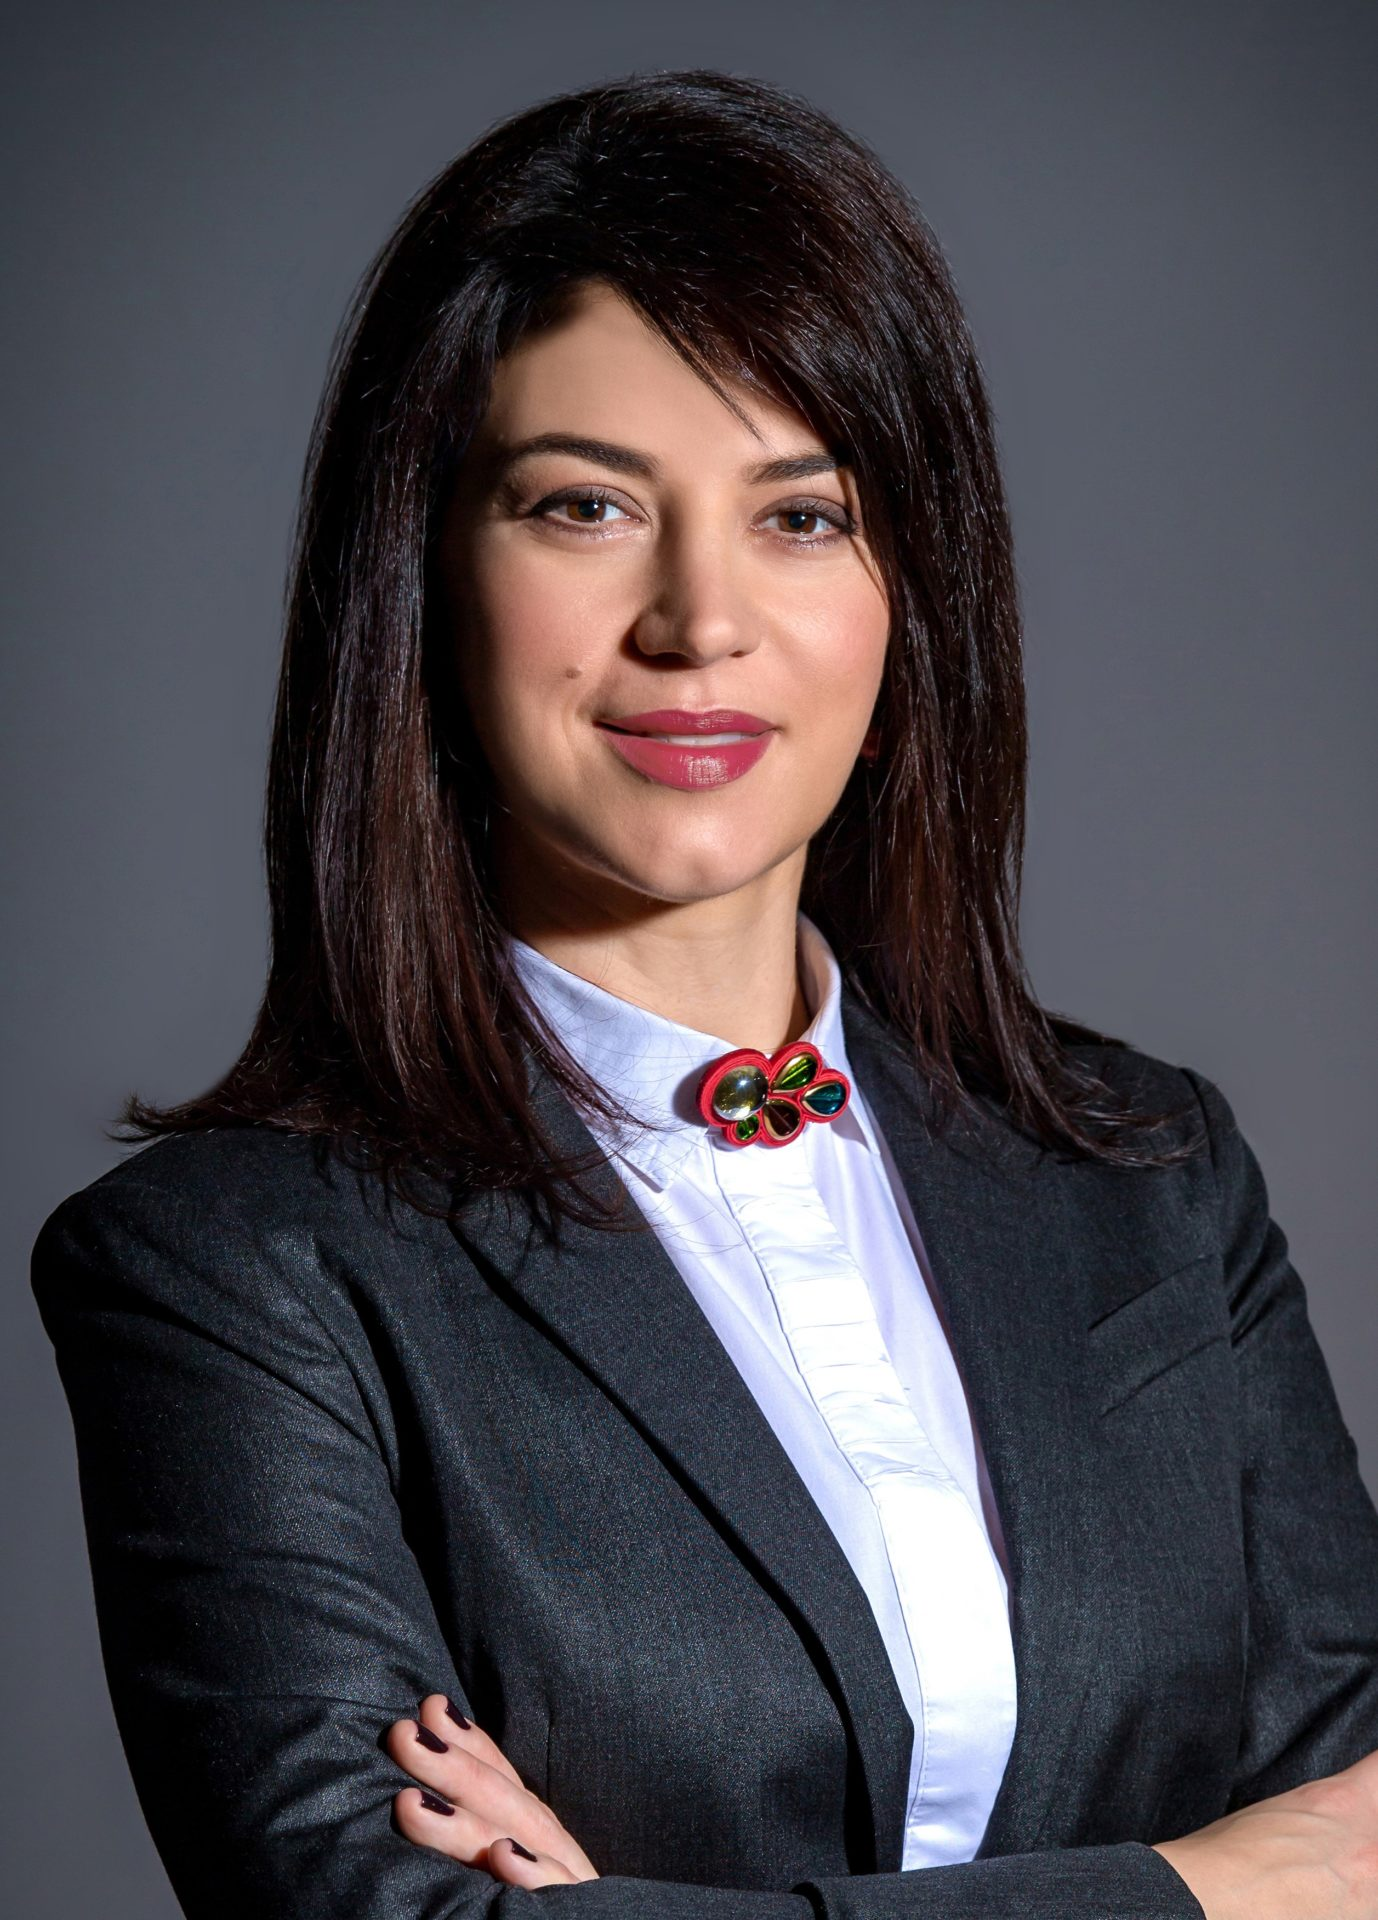 Speaker's photo